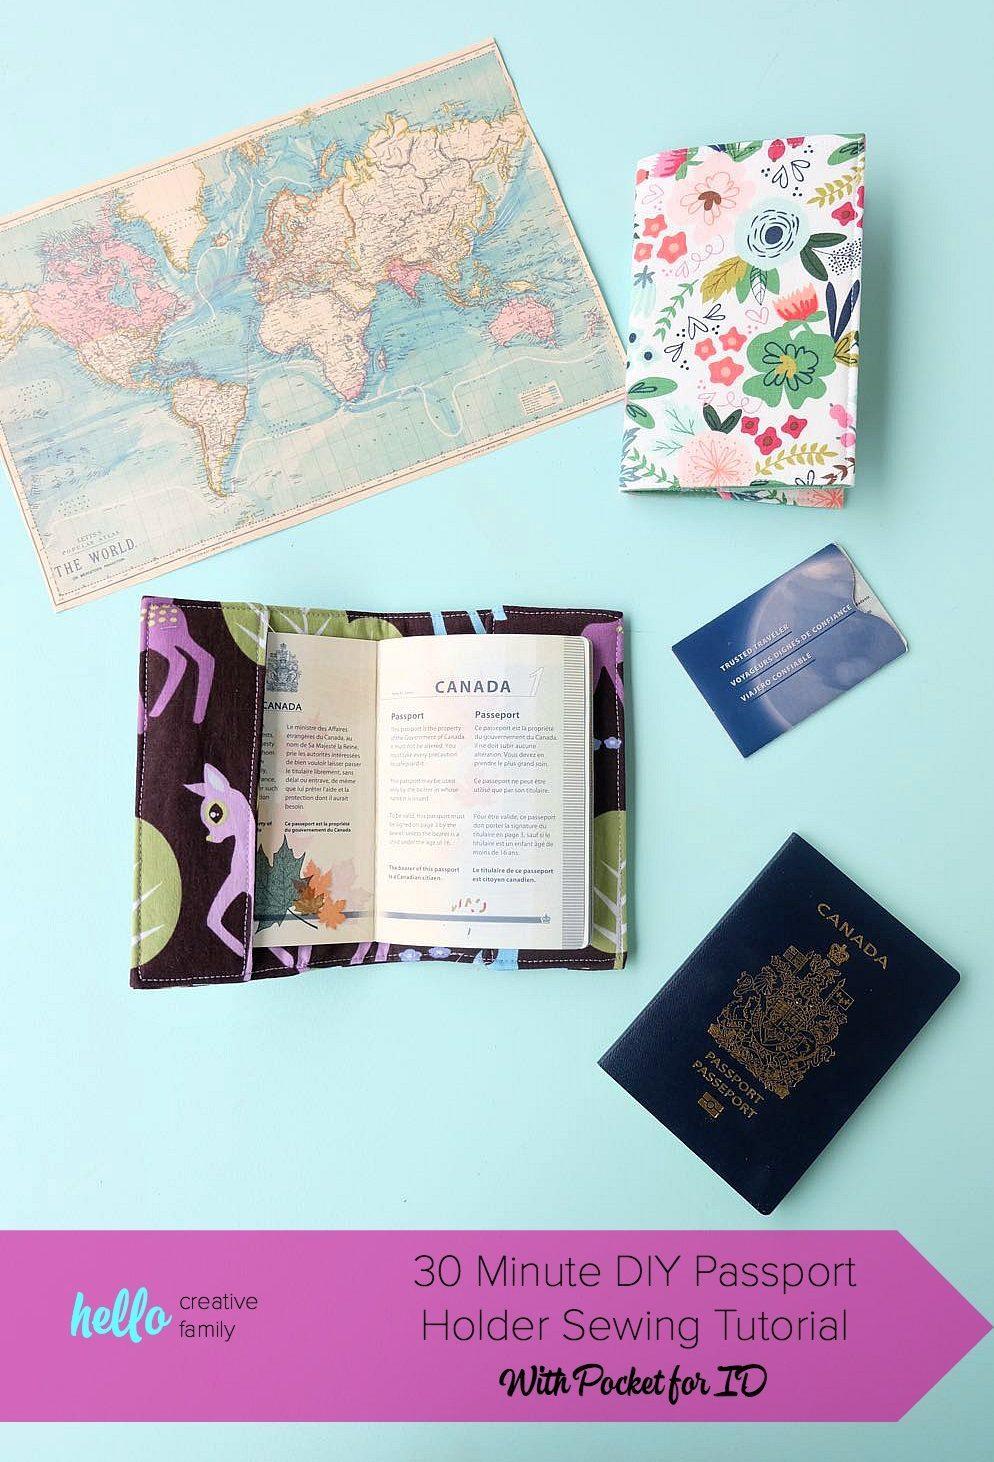 50 Easy Handmade Gift Ideas You'll Love: 30 Minute DIY Passport Holder